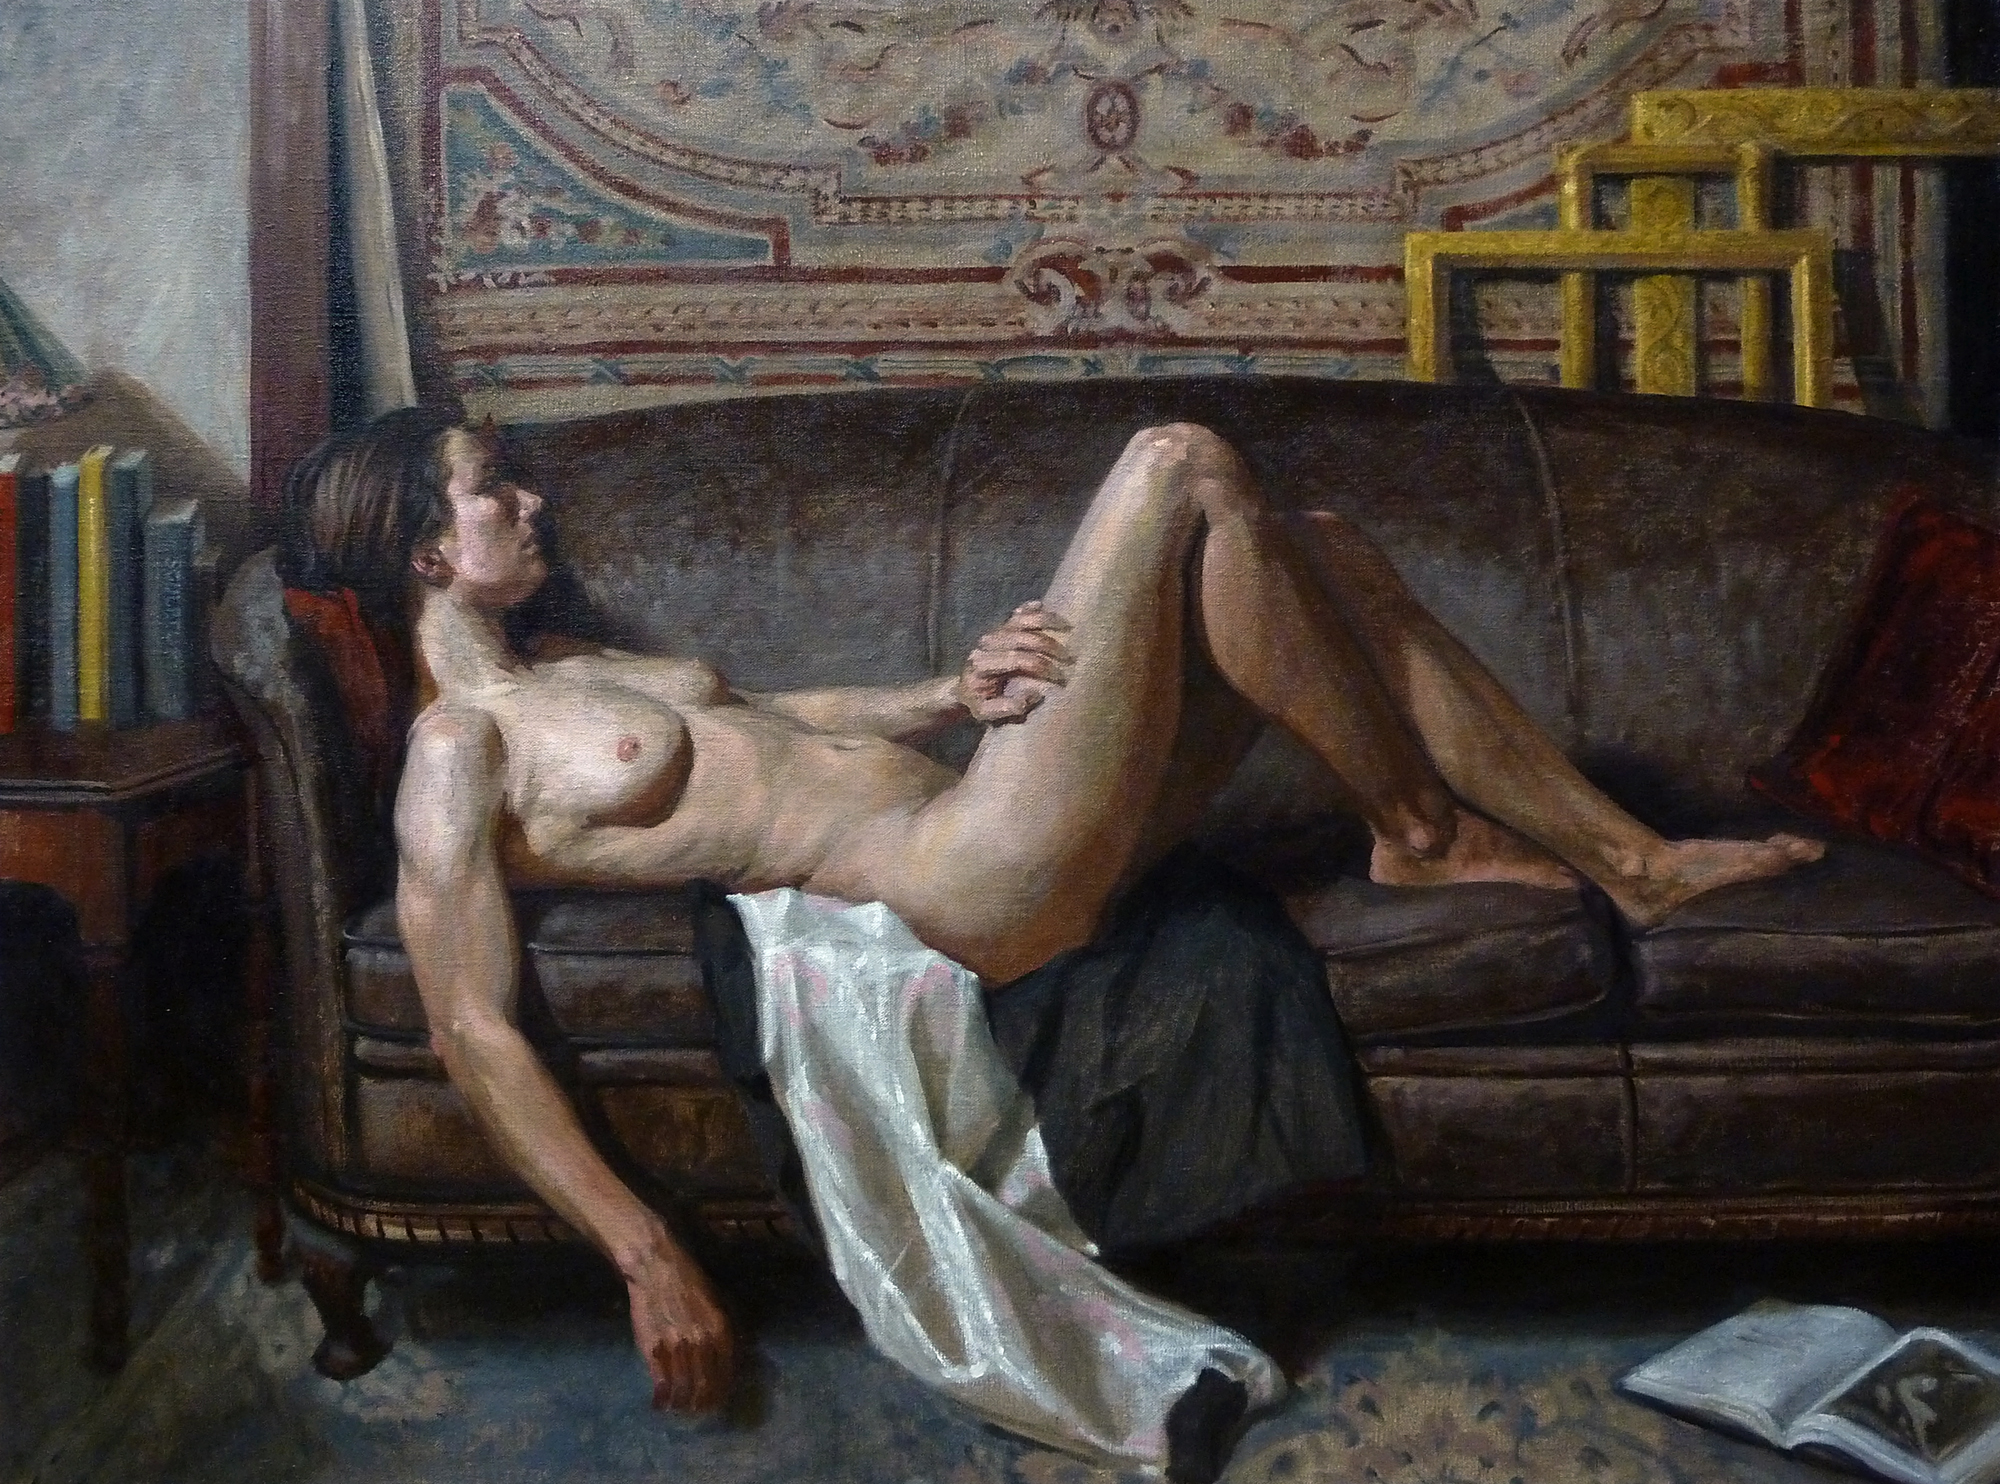 Reclining Female Nude in Studio